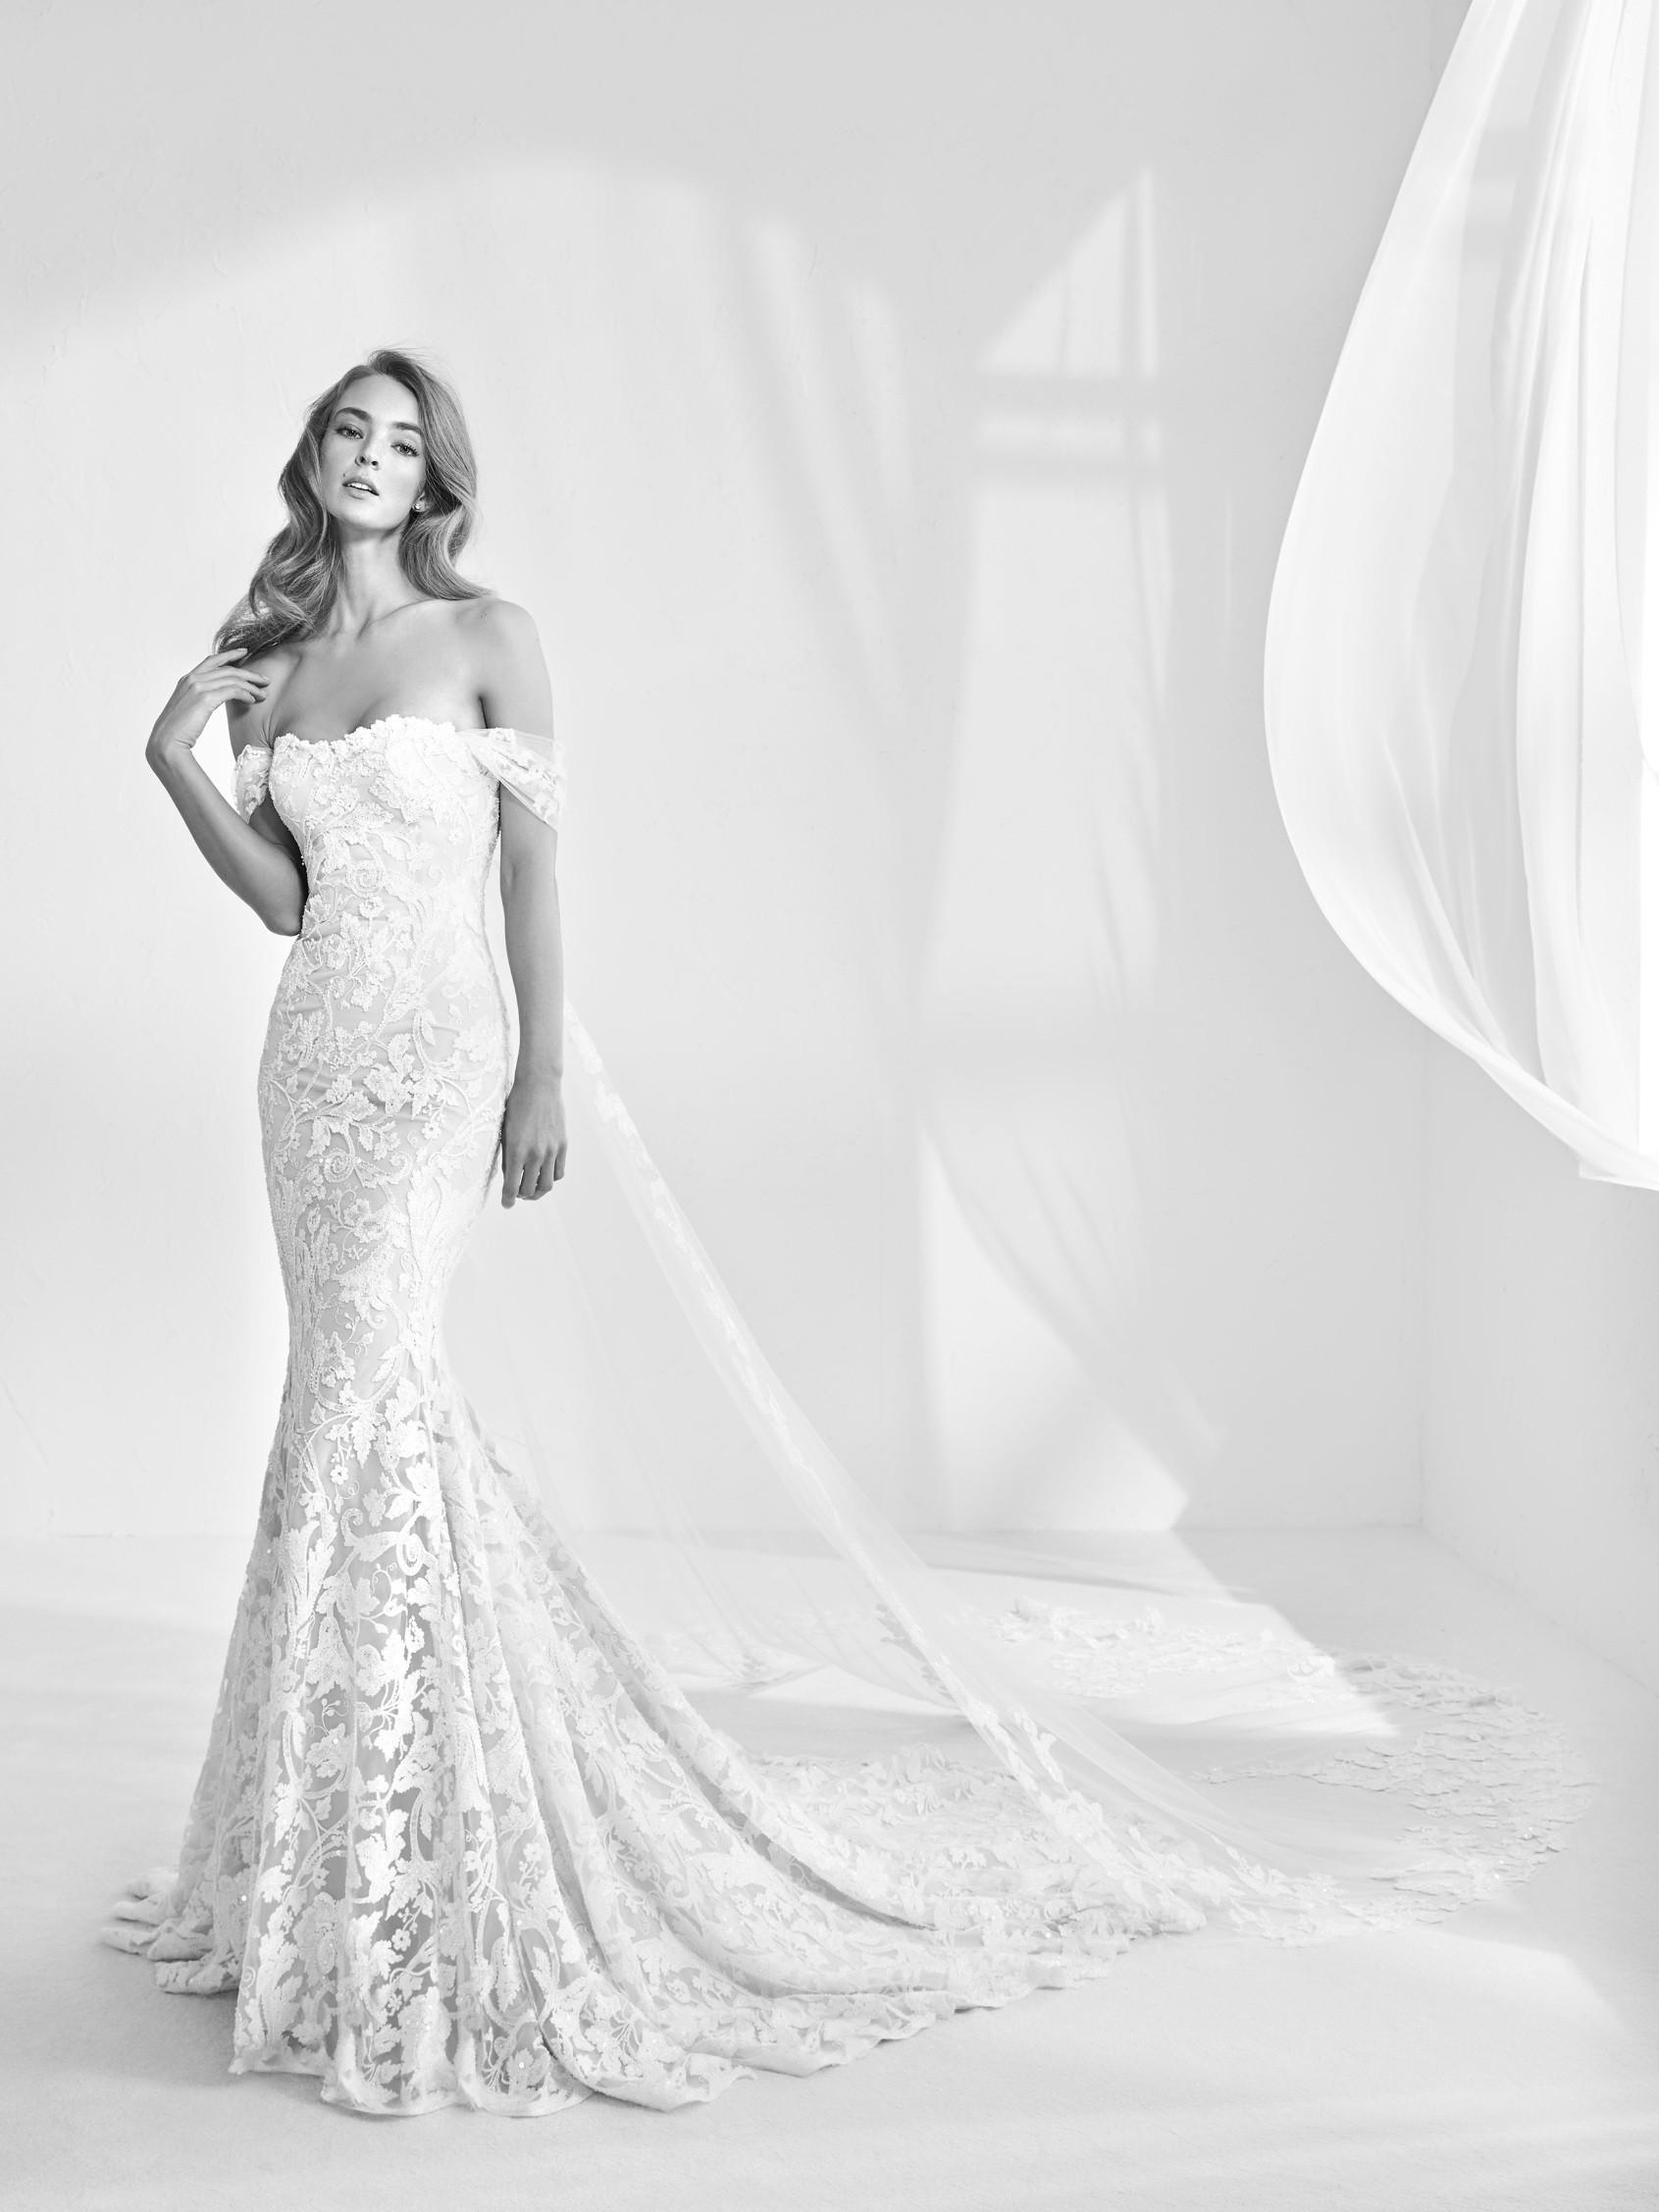 Mira Couture Atelier Pronovias Rani Wedding Bridal Gown Dress Chicago Boutique Front